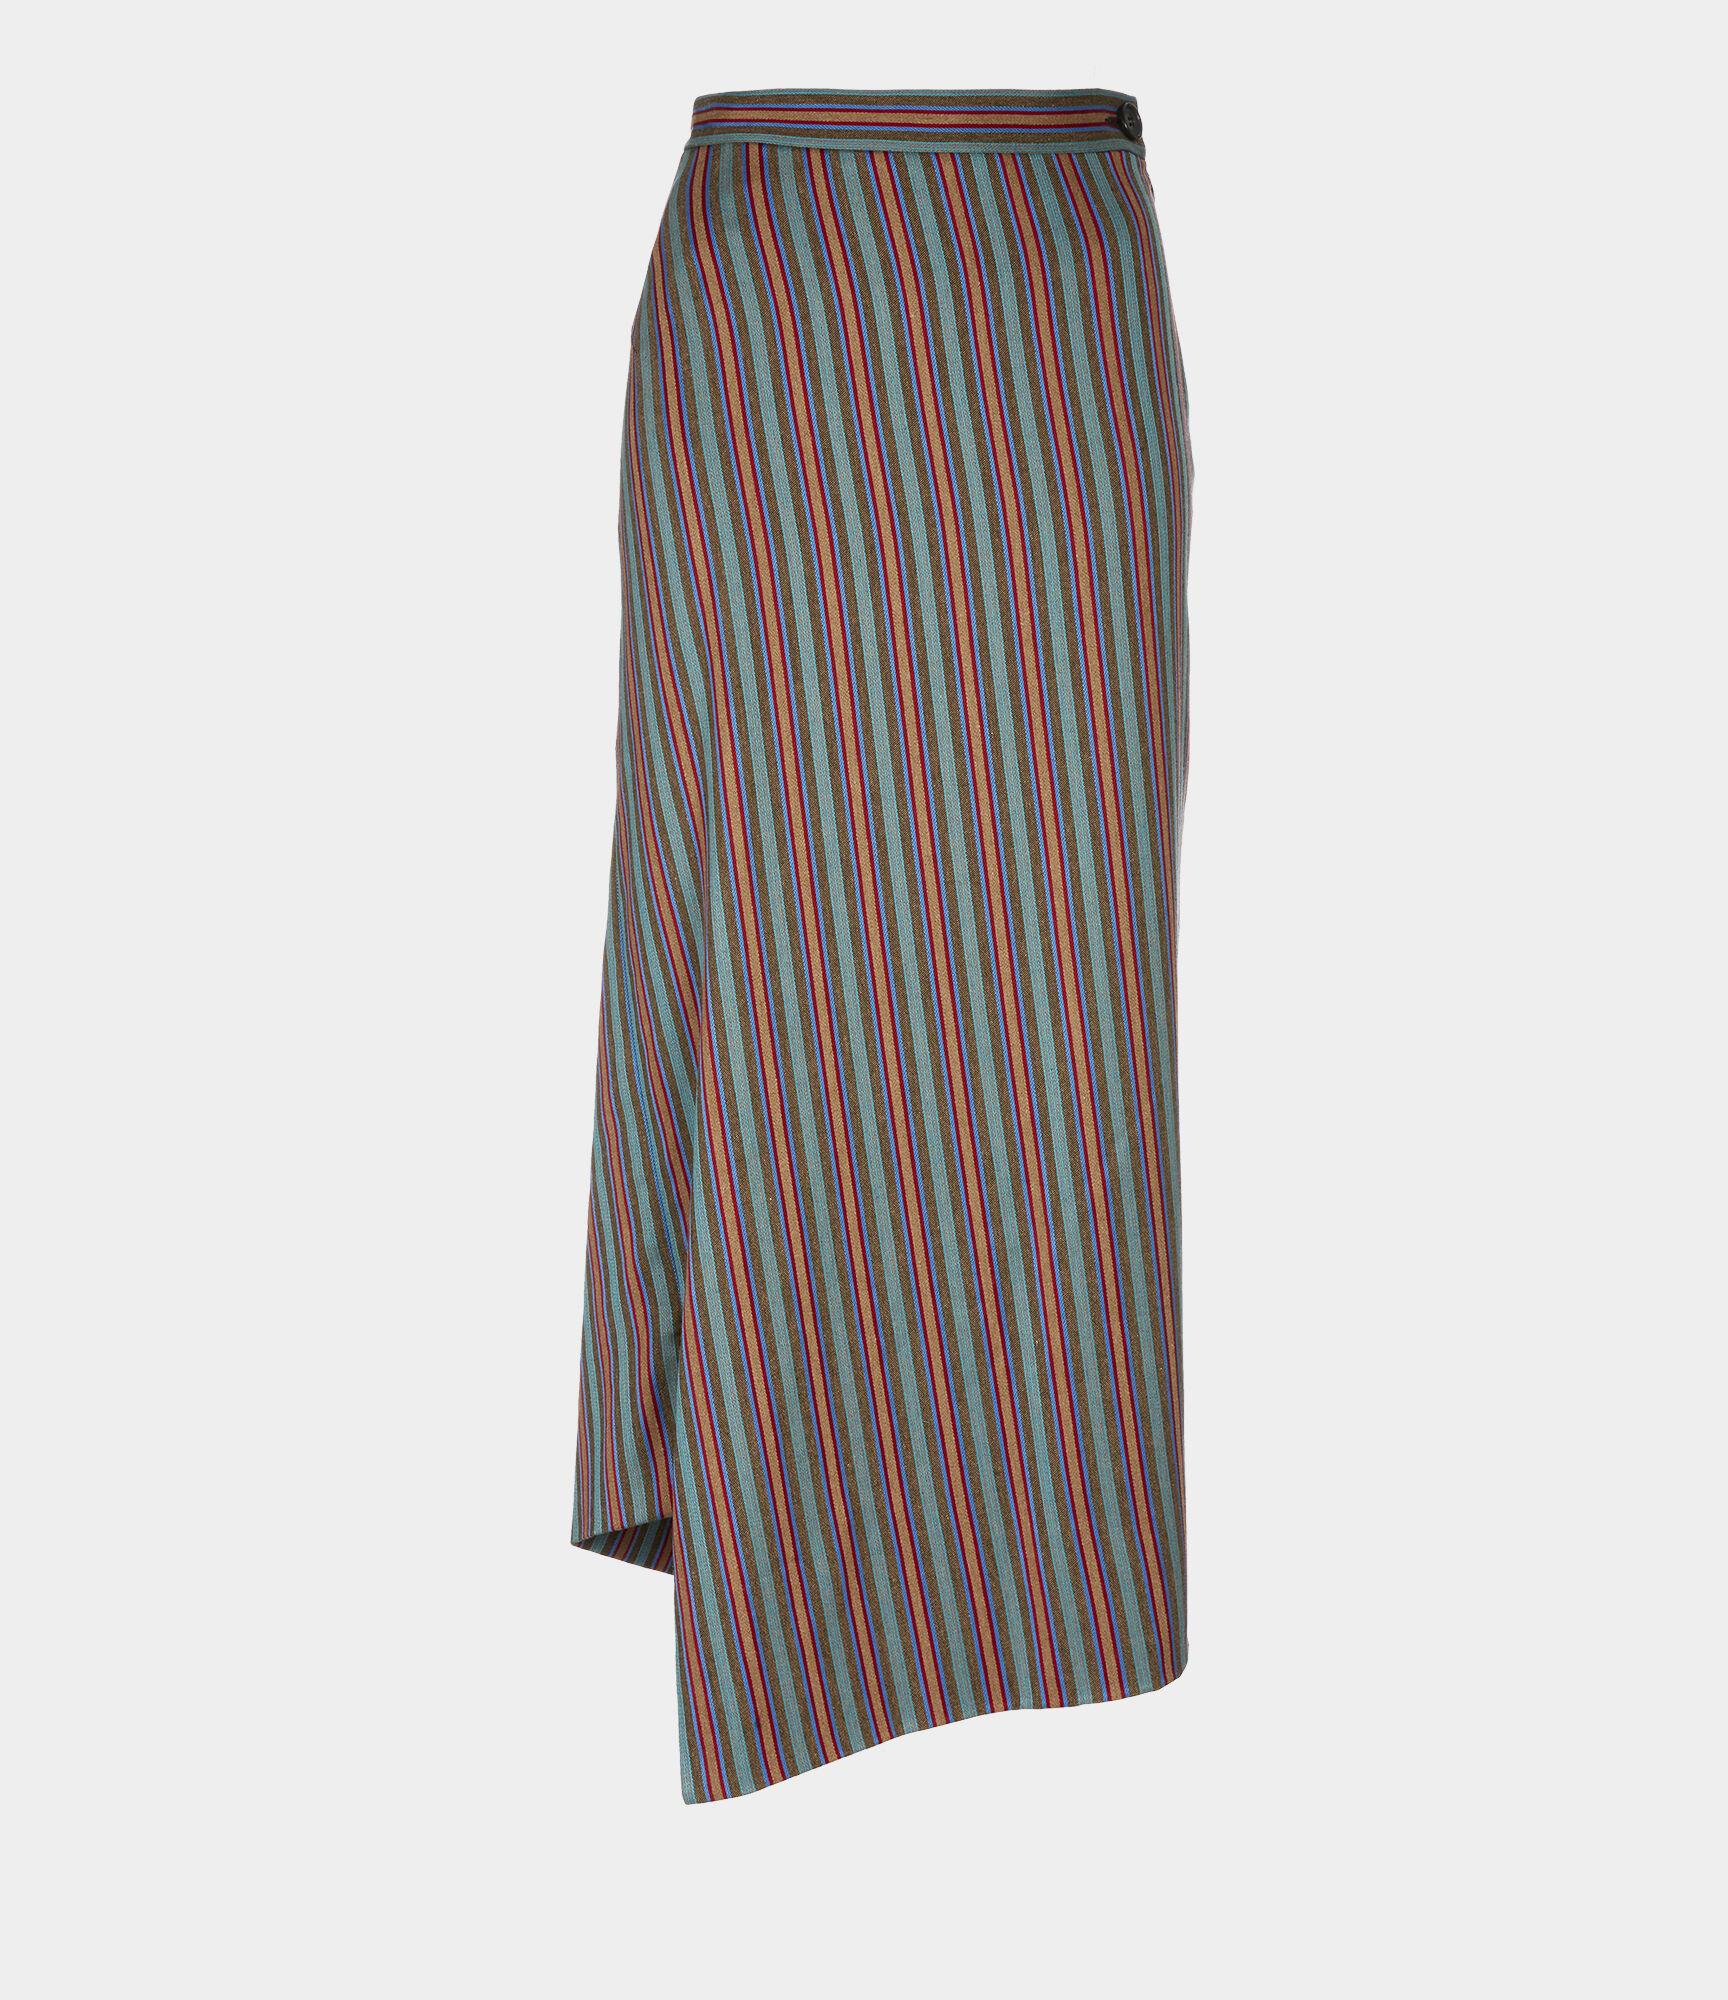 Midi Infinity Asymmetric Midi Skirt in Multi